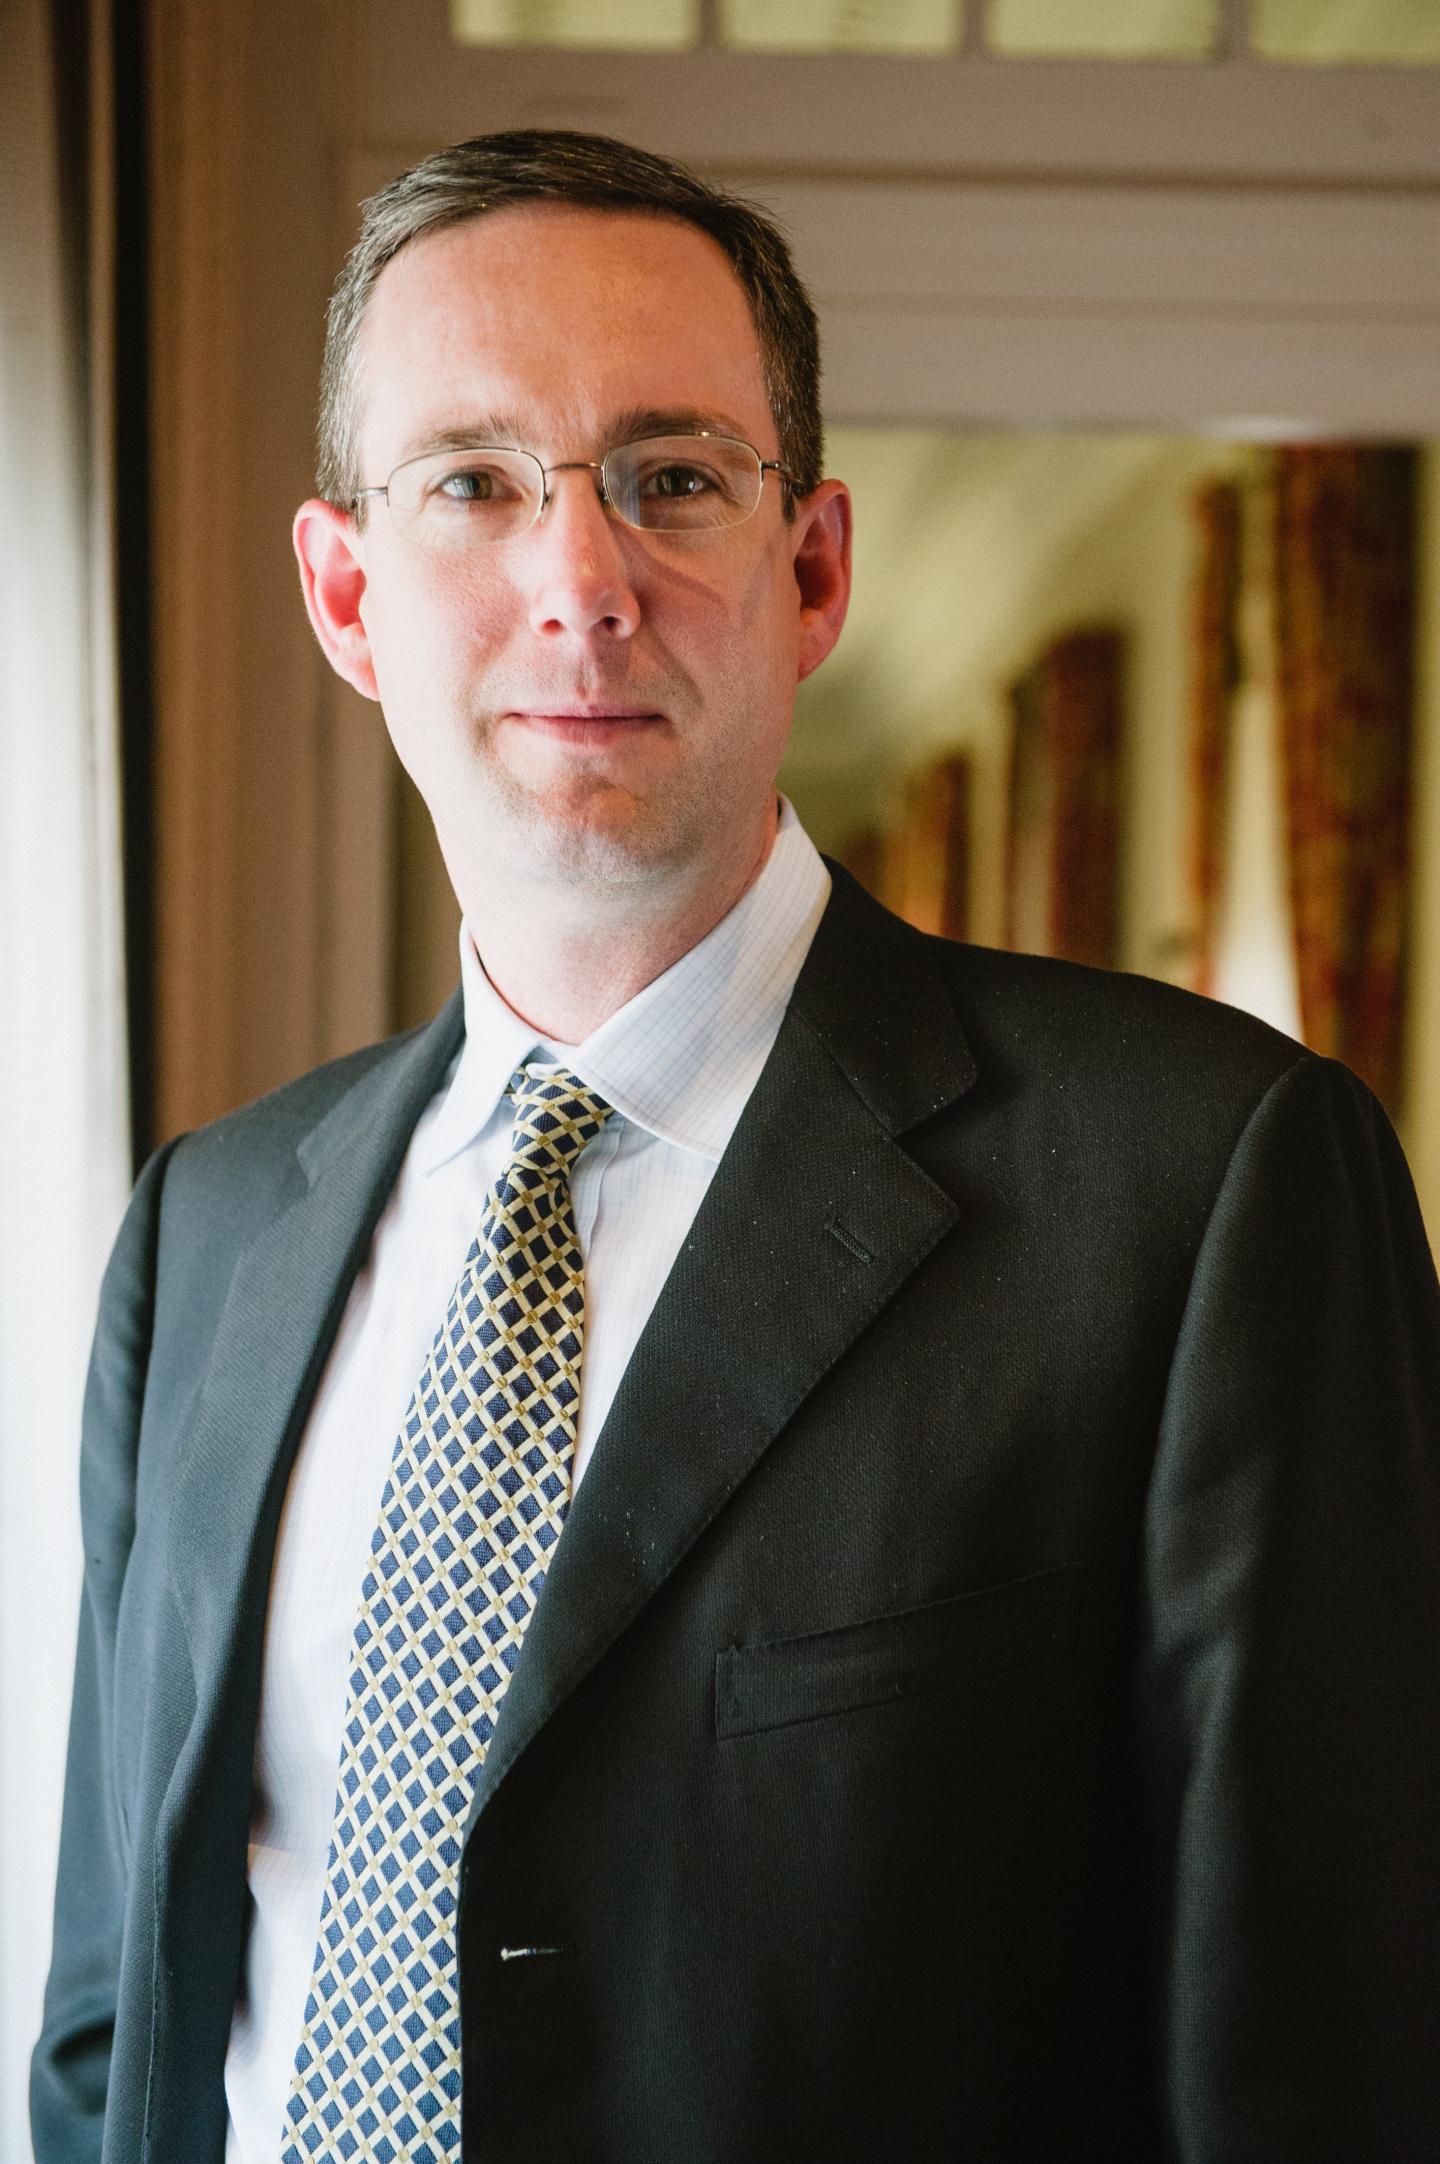 Chris Lorson, University of Missouri-Columbia